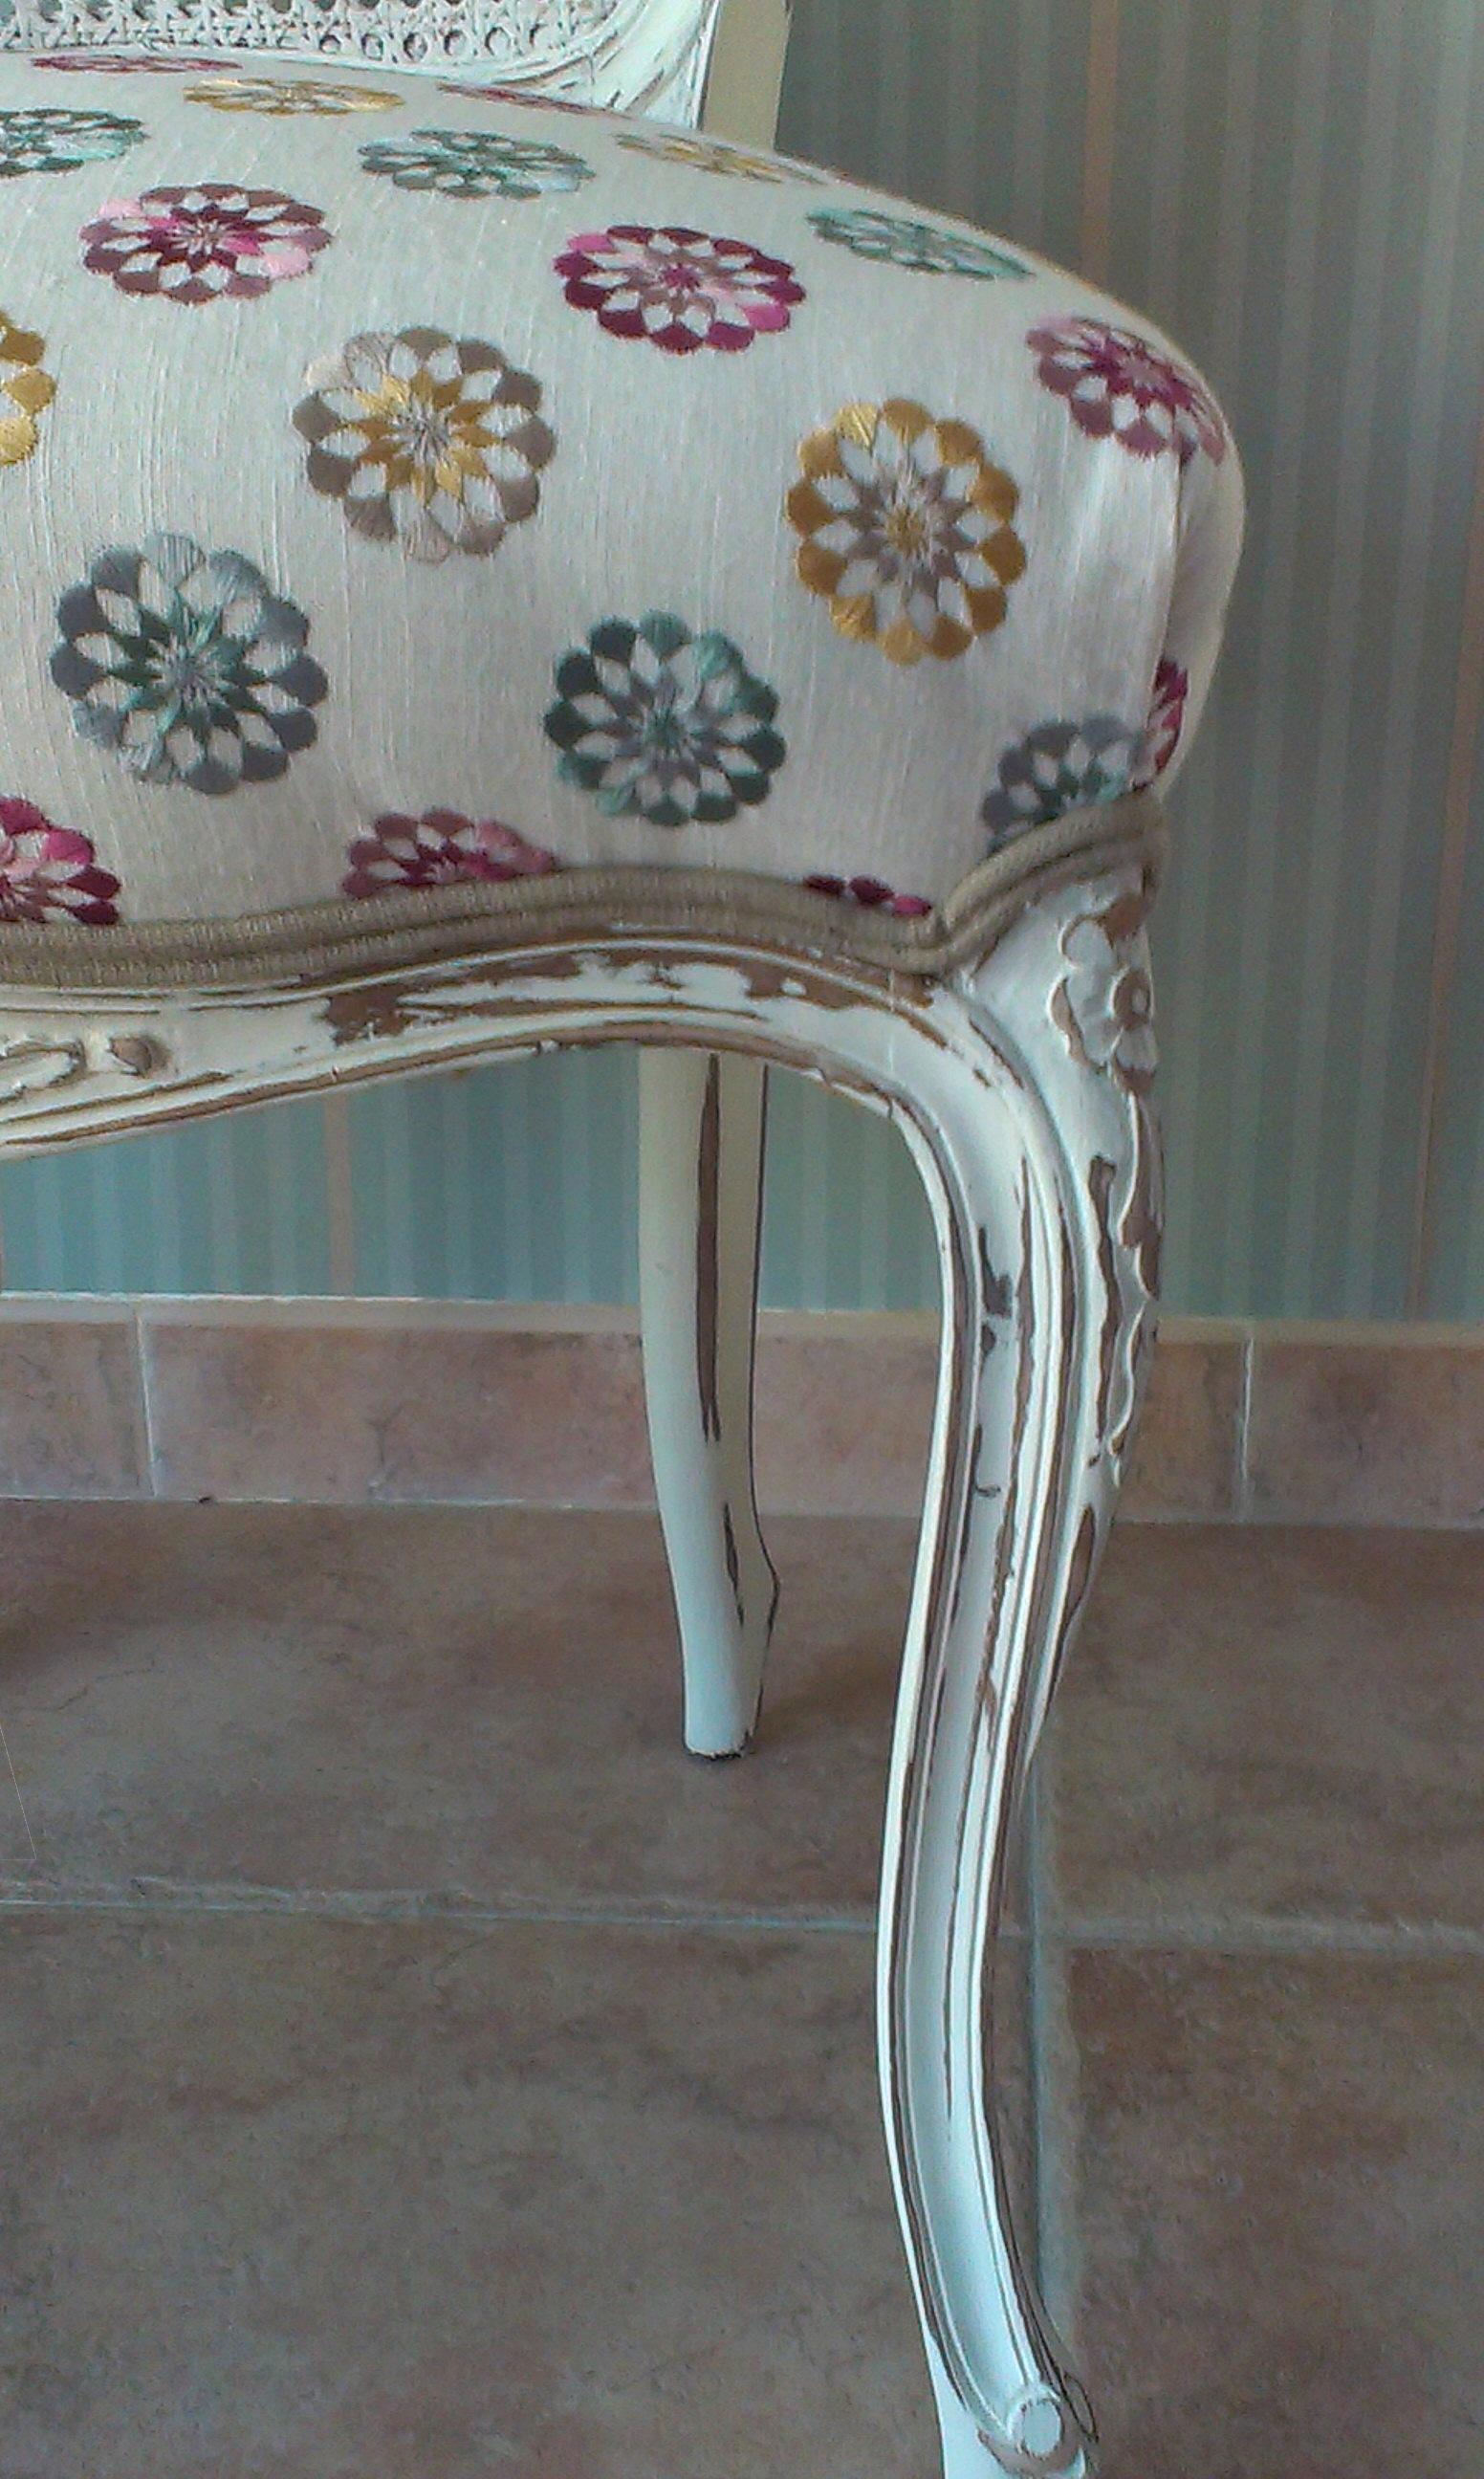 Sillas vintage estilo luis xv vintage chairs louis xv - Sillas tapizadas vintage ...